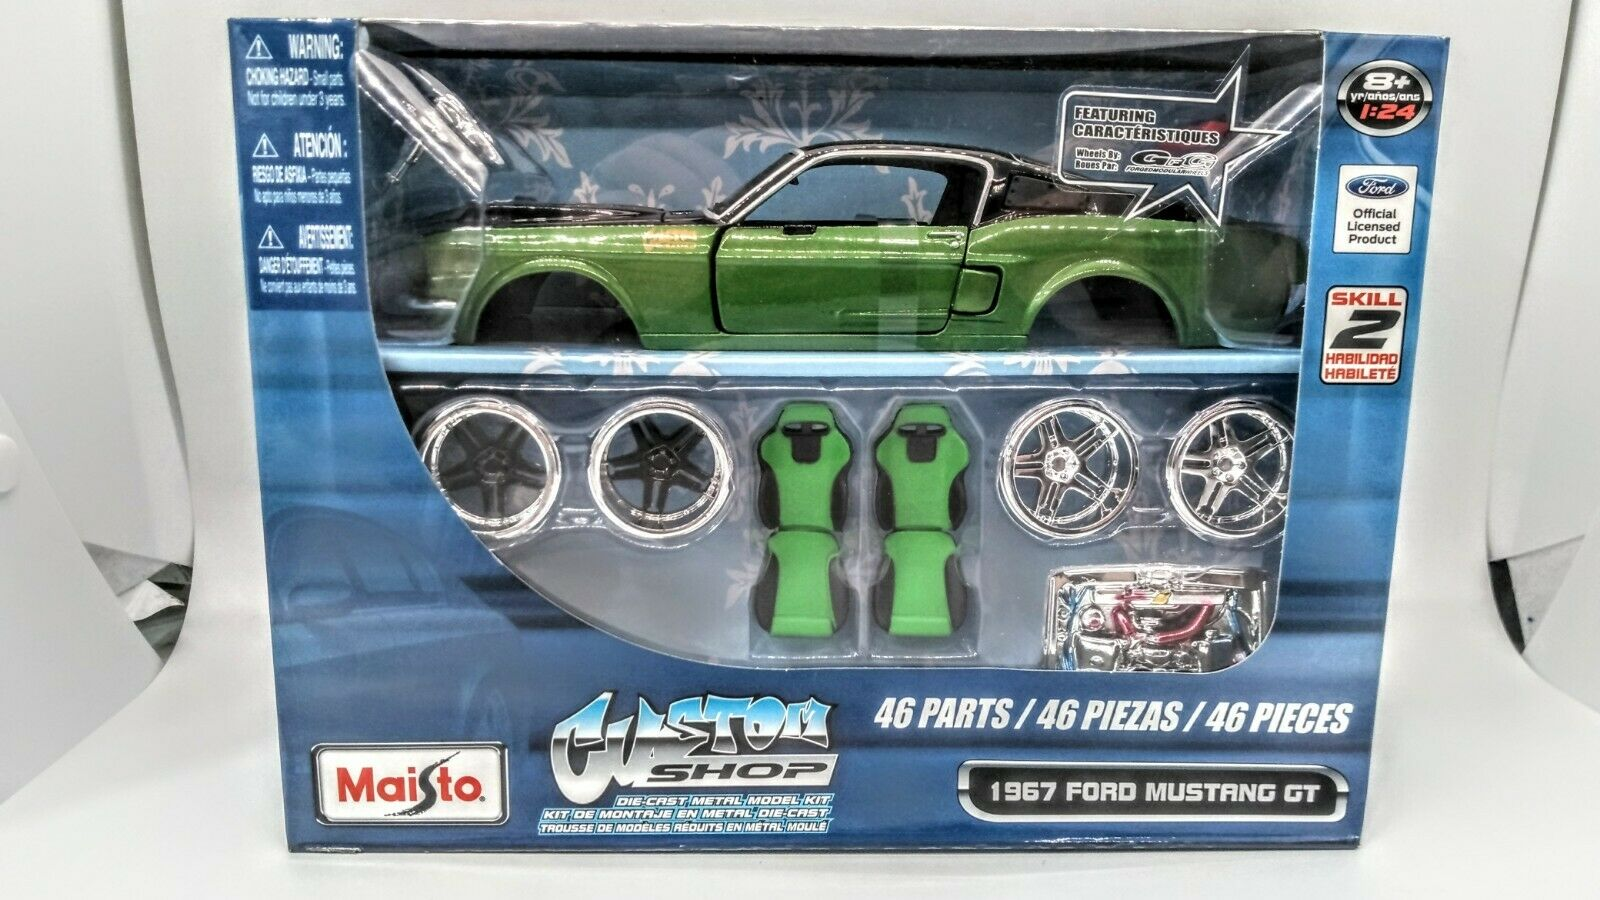 Burago 1 24 Die Cast Metal 5182 Ford Mustang Indy Model Kit For Sale Online Ebay